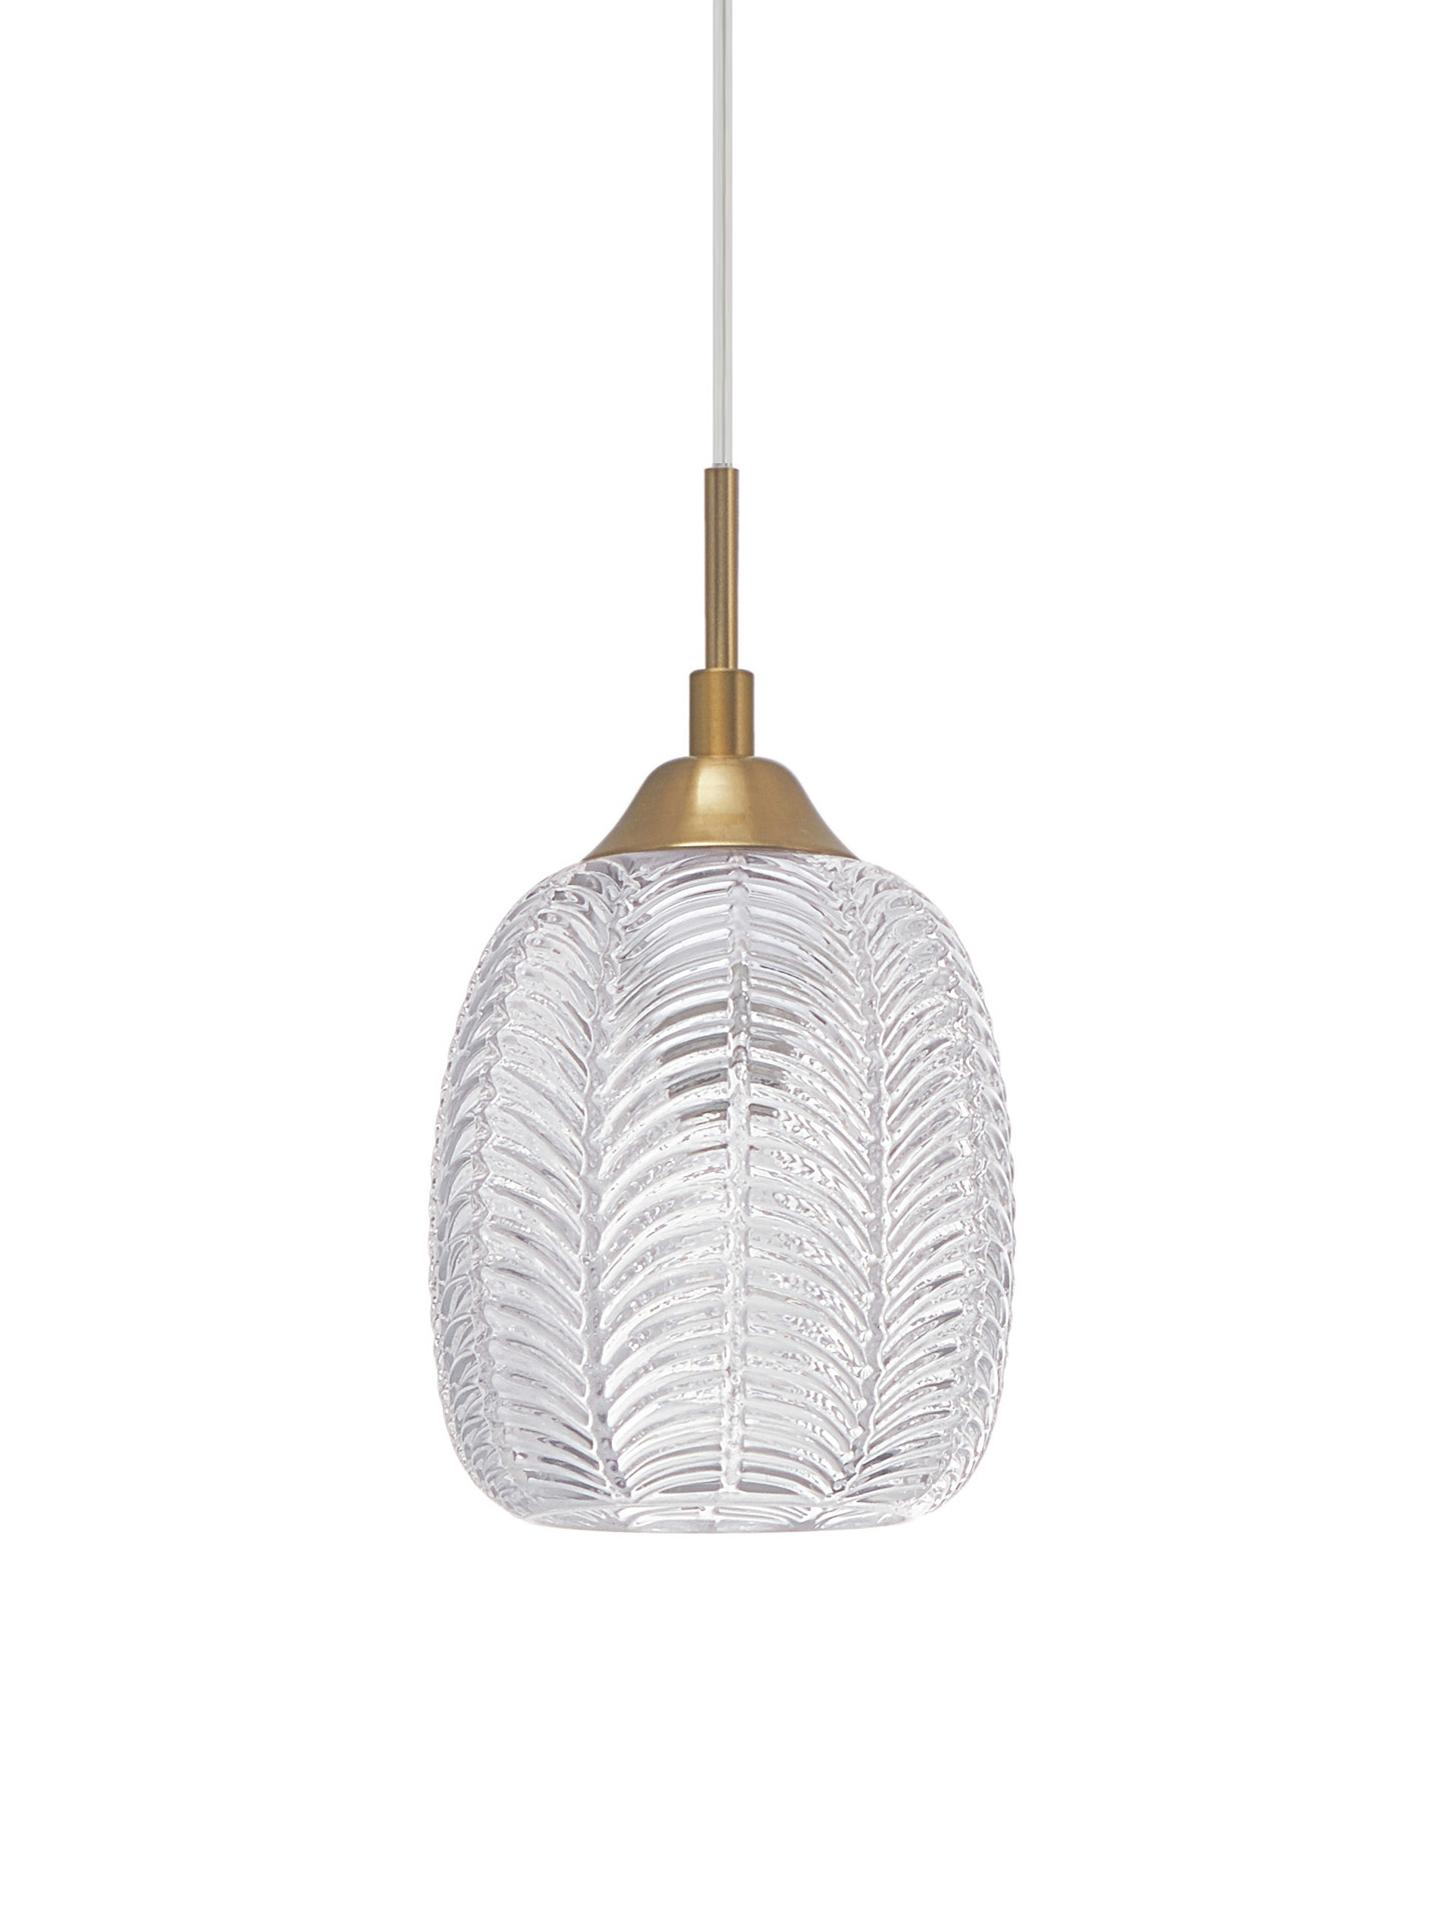 Kleine hanglamp Vario van gesatineerd glas, Lampenkap: gesatineerd glas, Baldakijn: gecoat aluminium, Messingkleurig, transparant, Ø 14 x H 120 cm